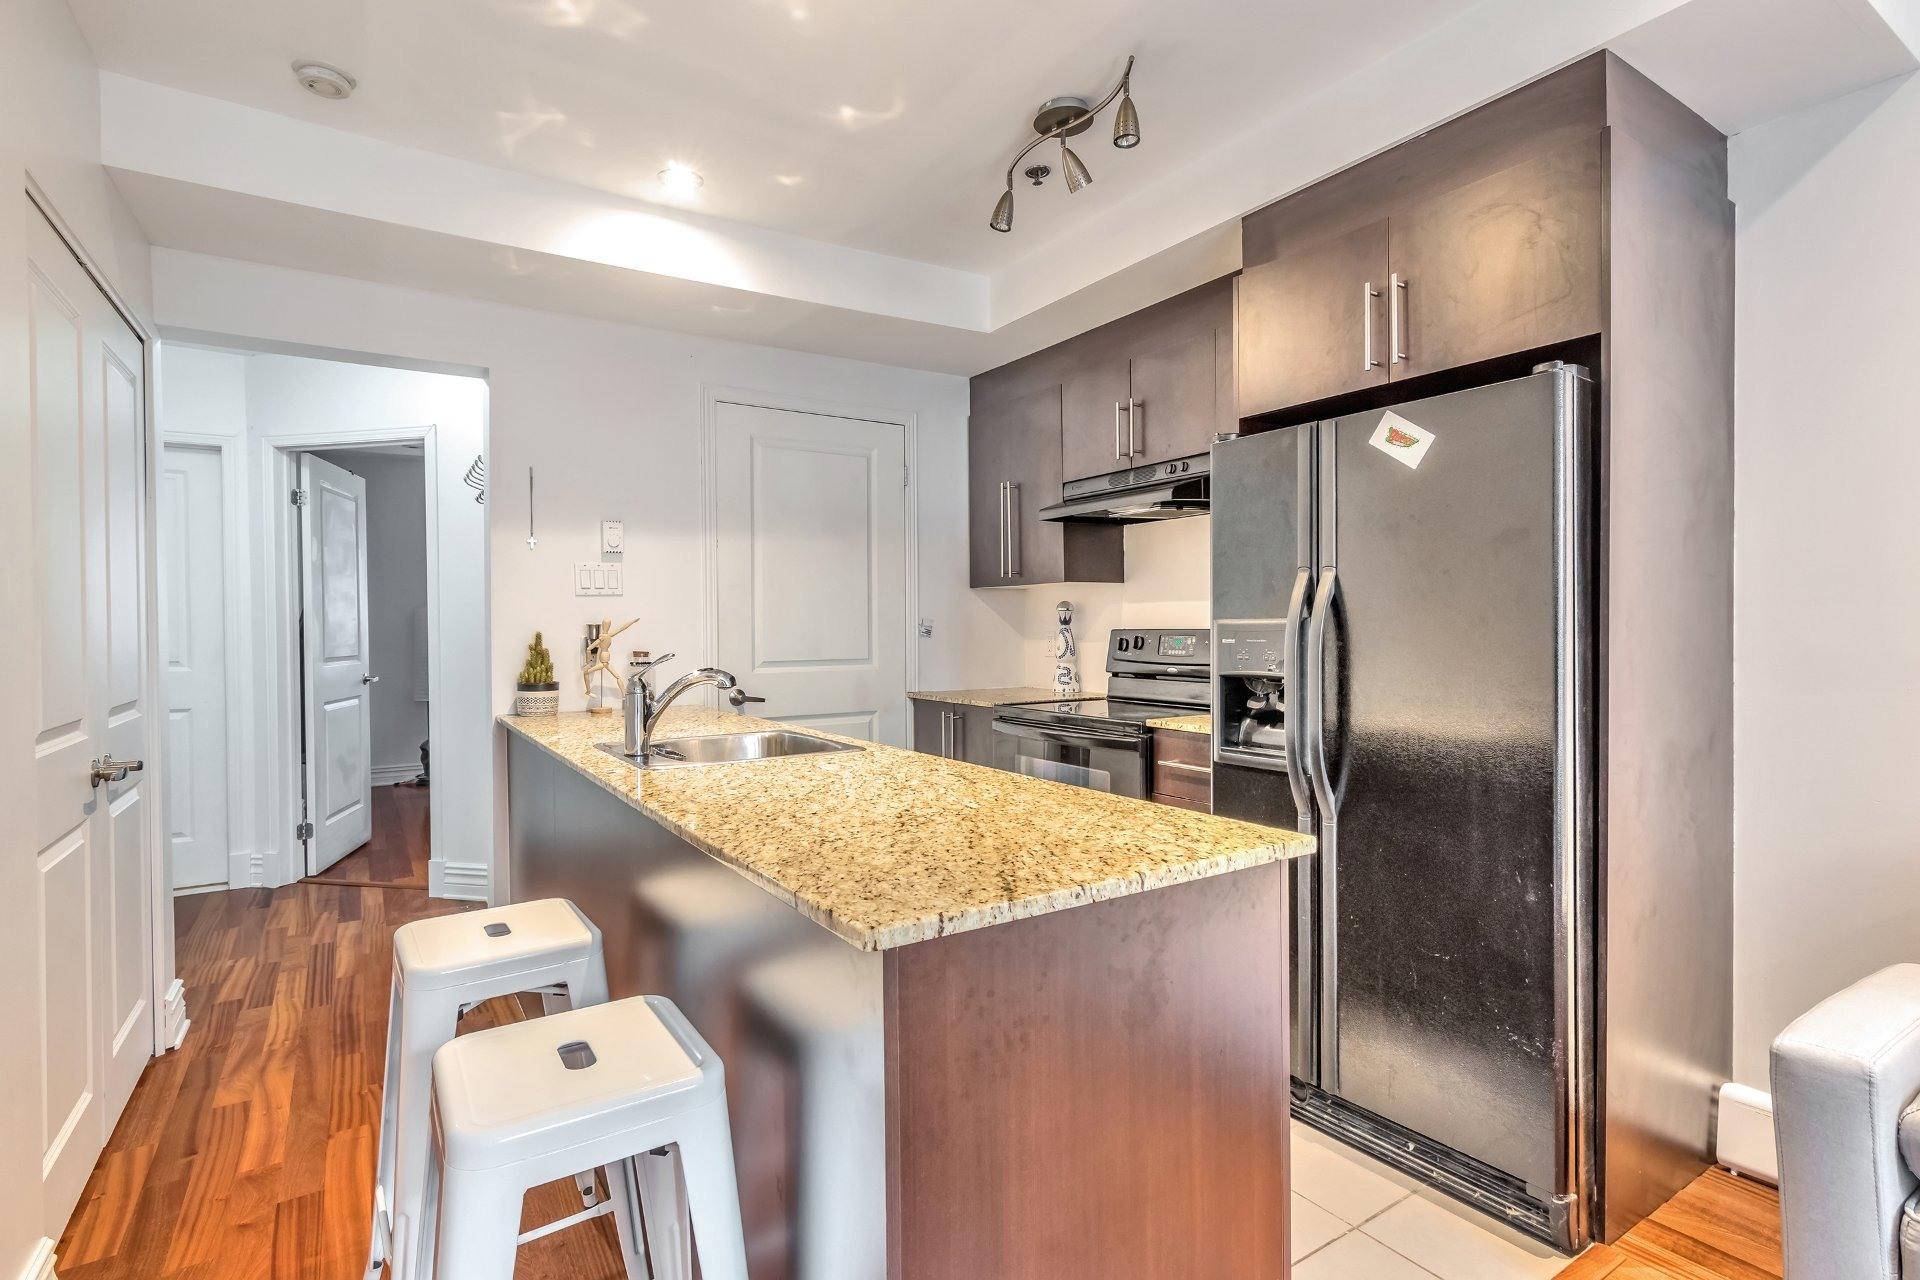 image 7 - Departamento En venta Le Plateau-Mont-Royal Montréal  - 3 habitaciones